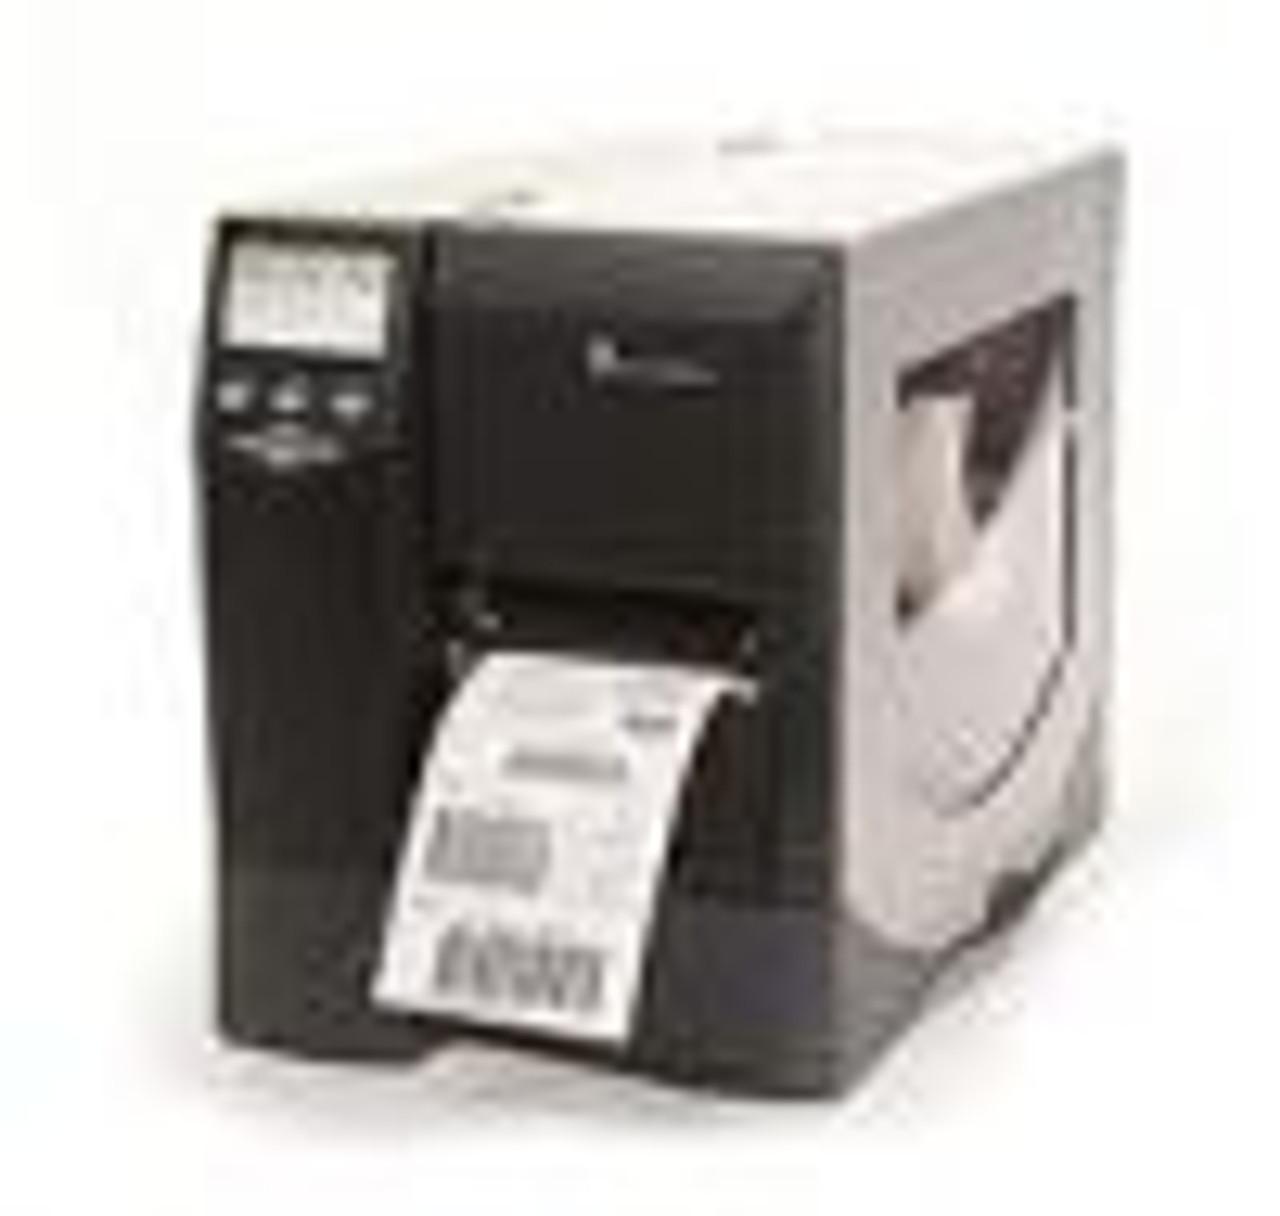 RZ400 Printers